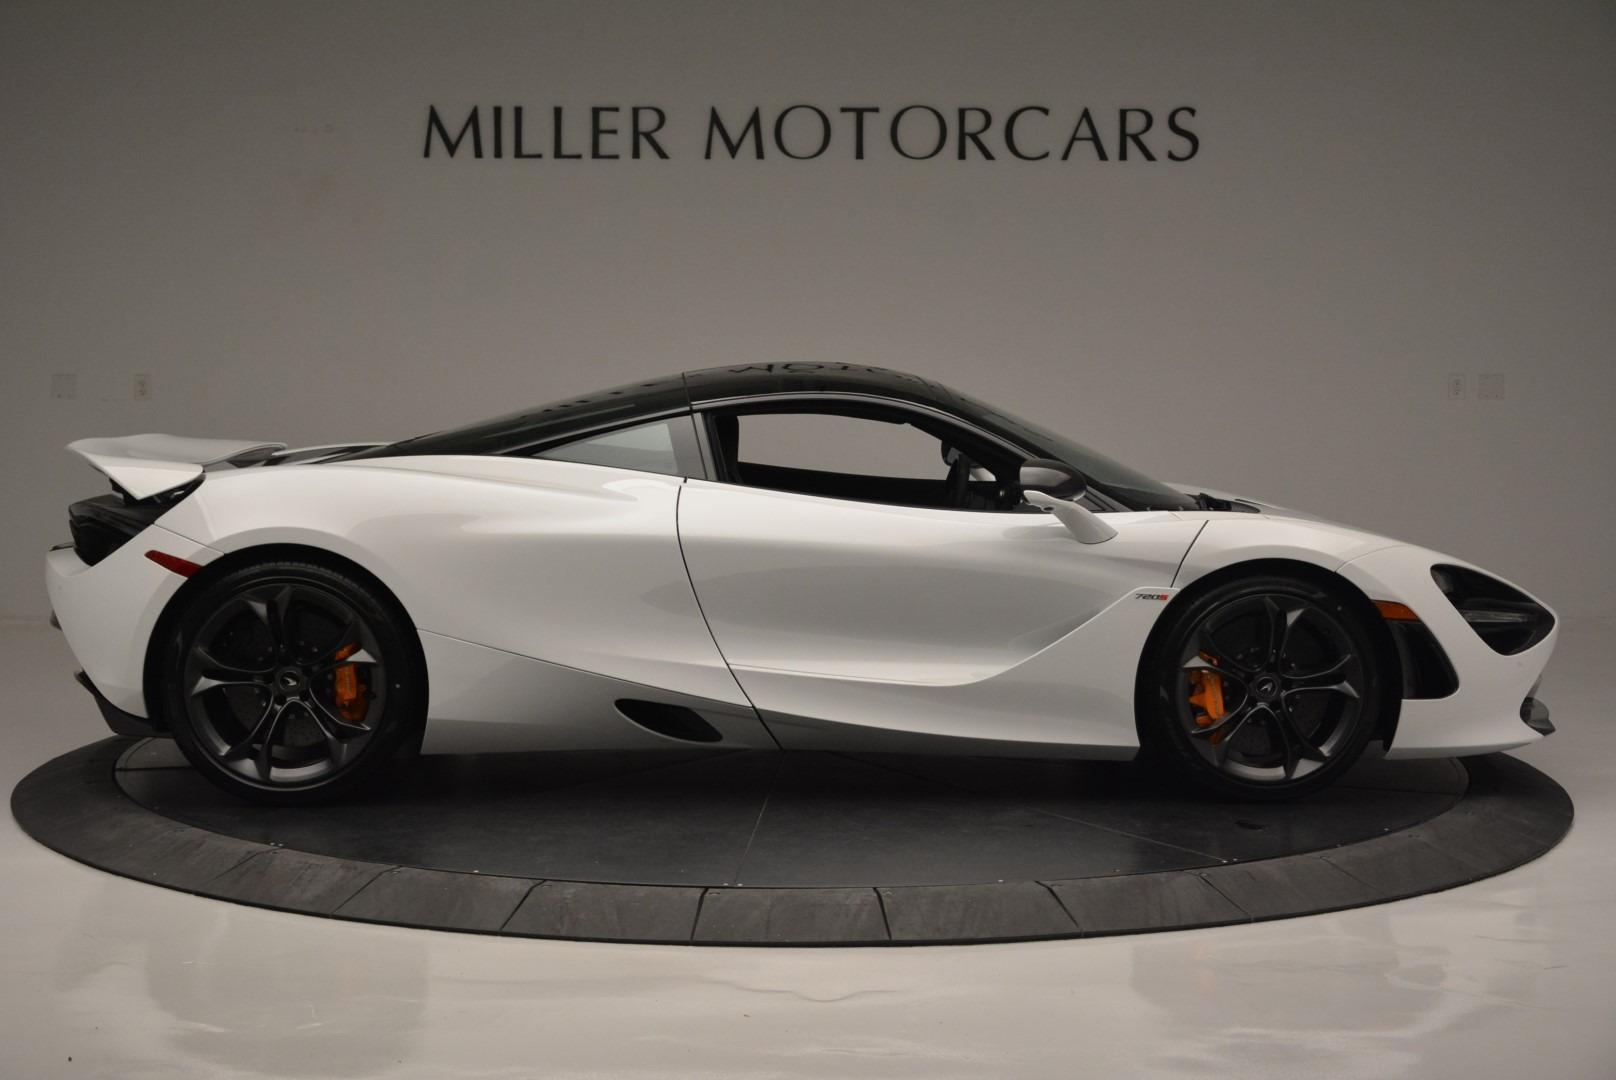 Used 2019 McLaren 720S Coupe For Sale In Westport, CT 2543_p9